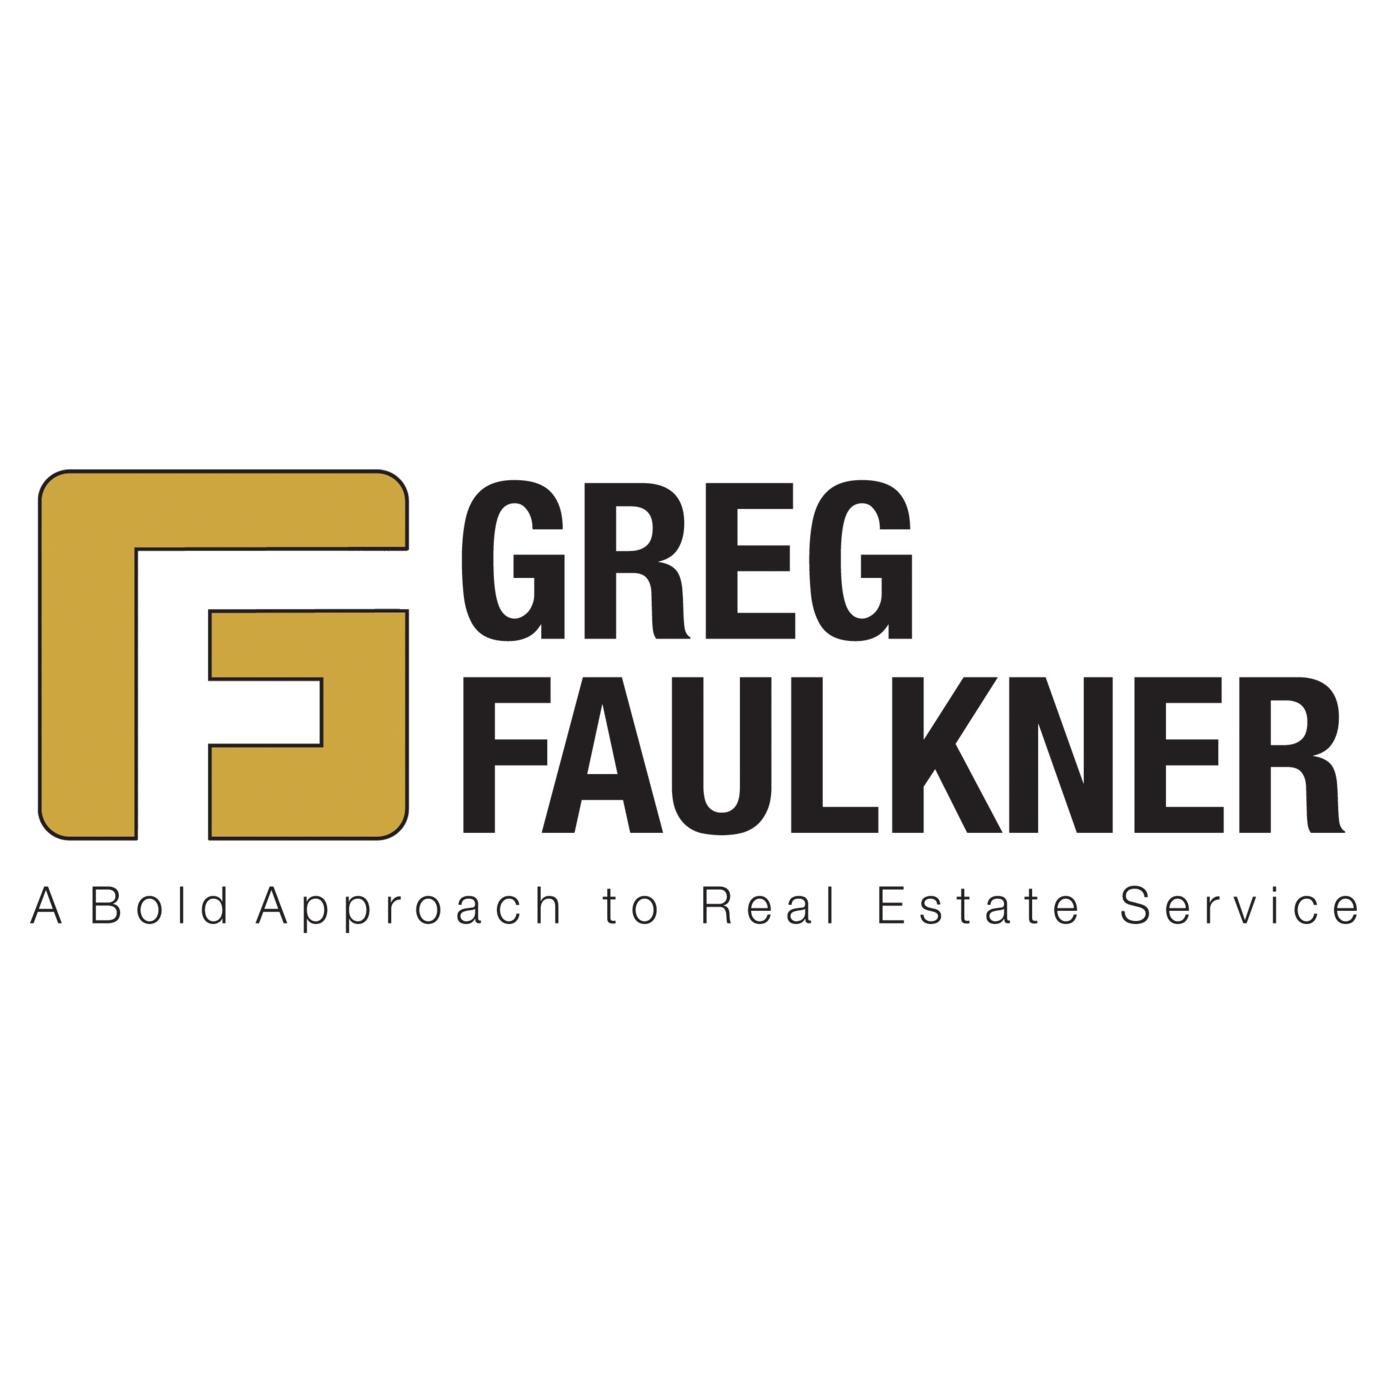 Greg Faulkner - Fathom Realty image 2